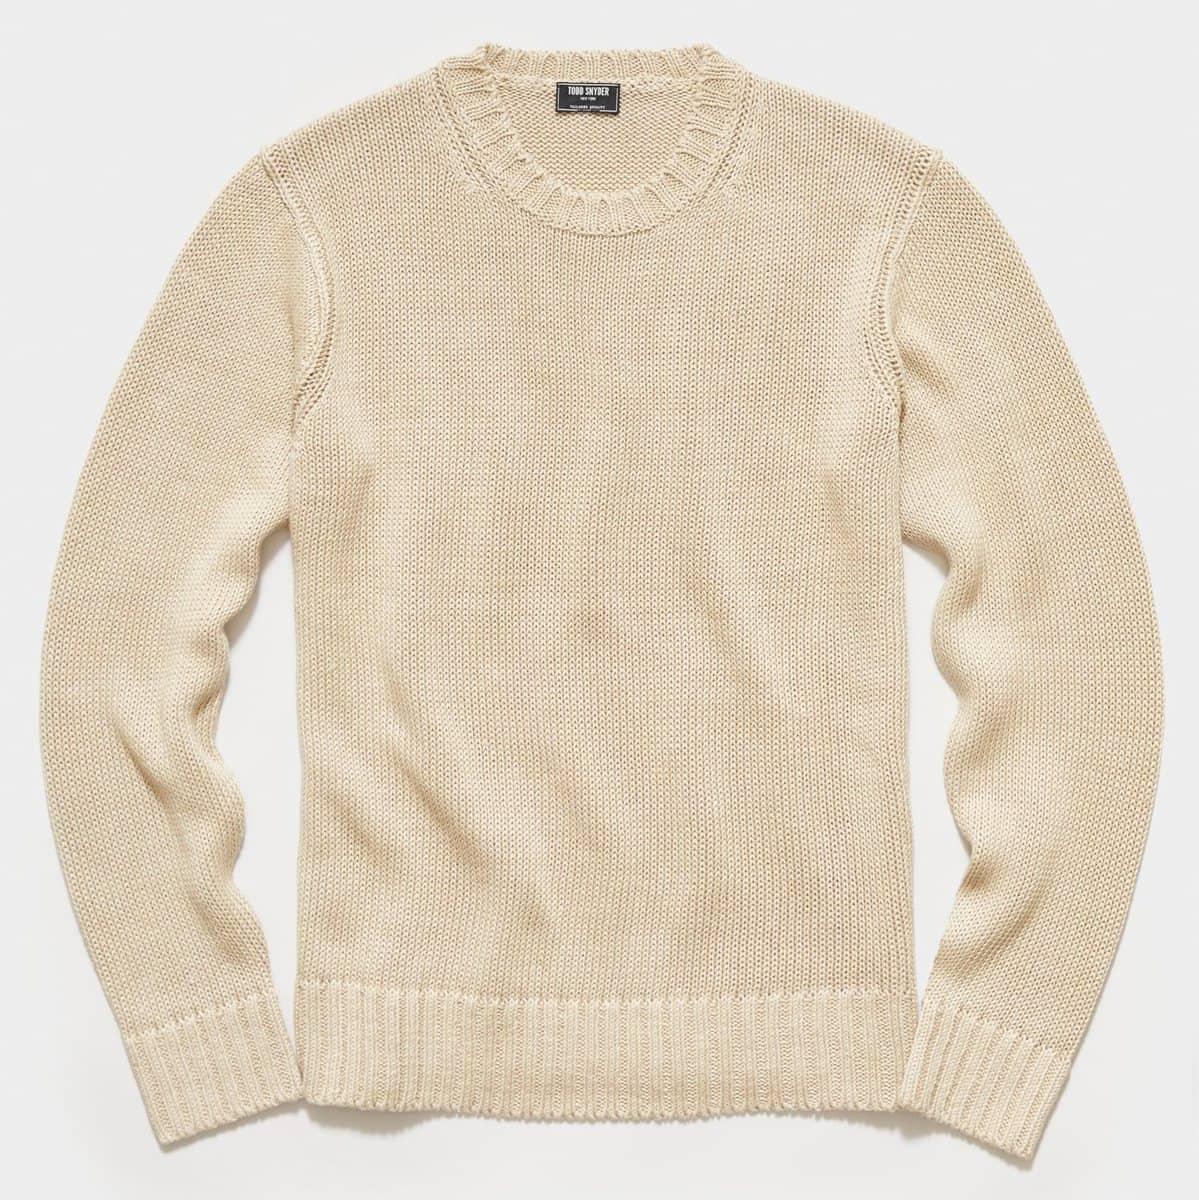 Todd Snyder Italian Linen Crewneck Sweater